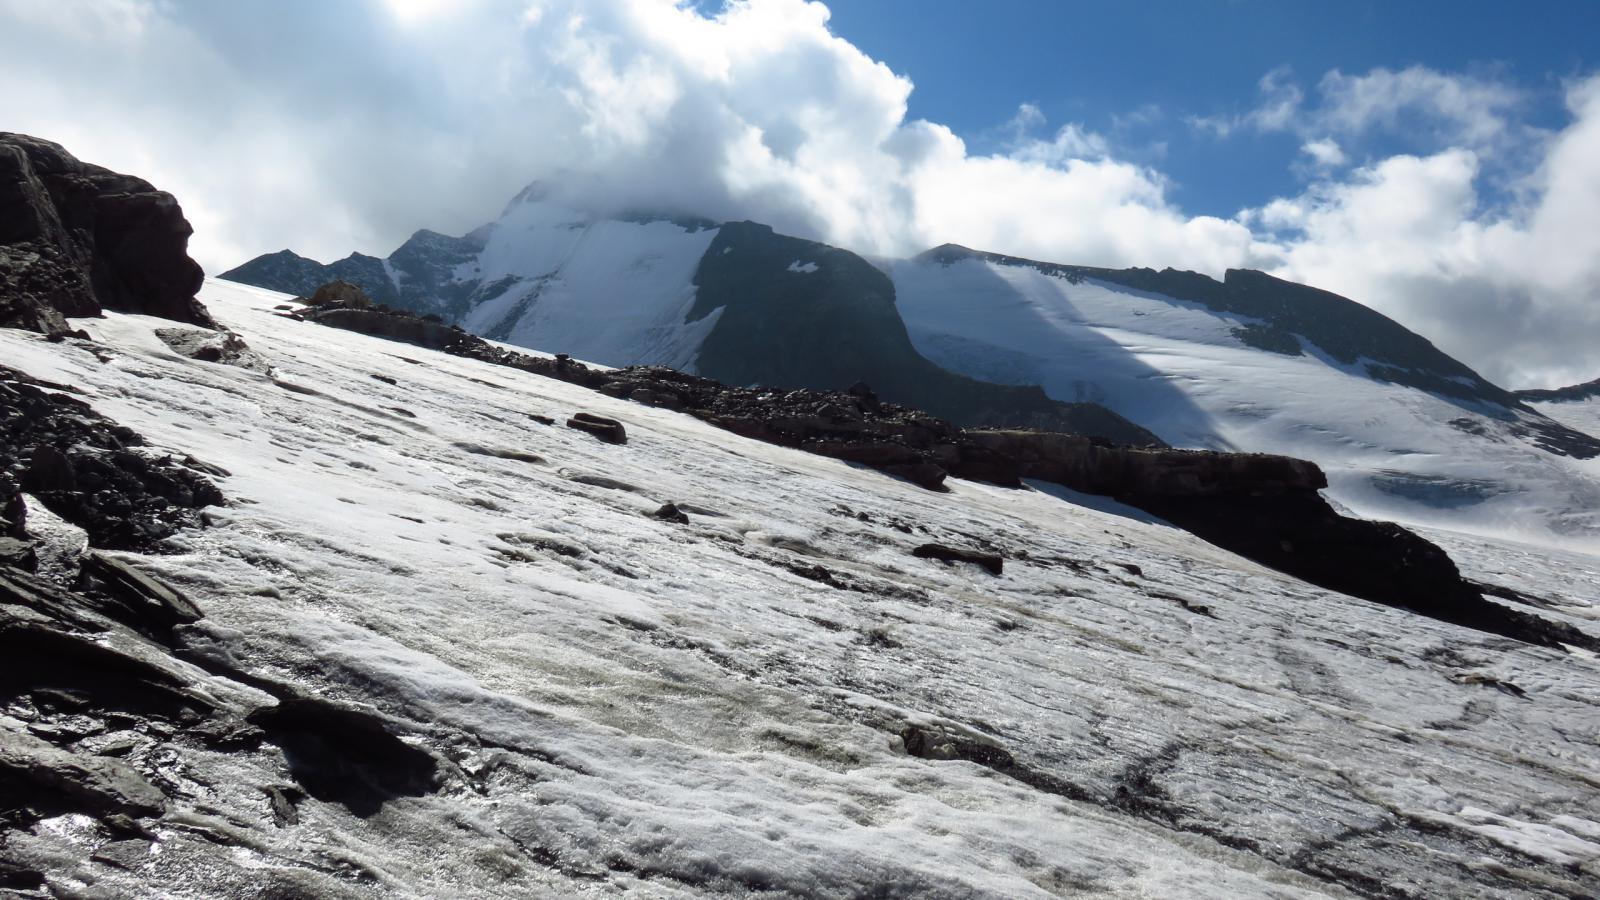 Ghiacciaio Sorce de l'Isère e Grande Aiguille Rousse viste dal Passo della Vacca